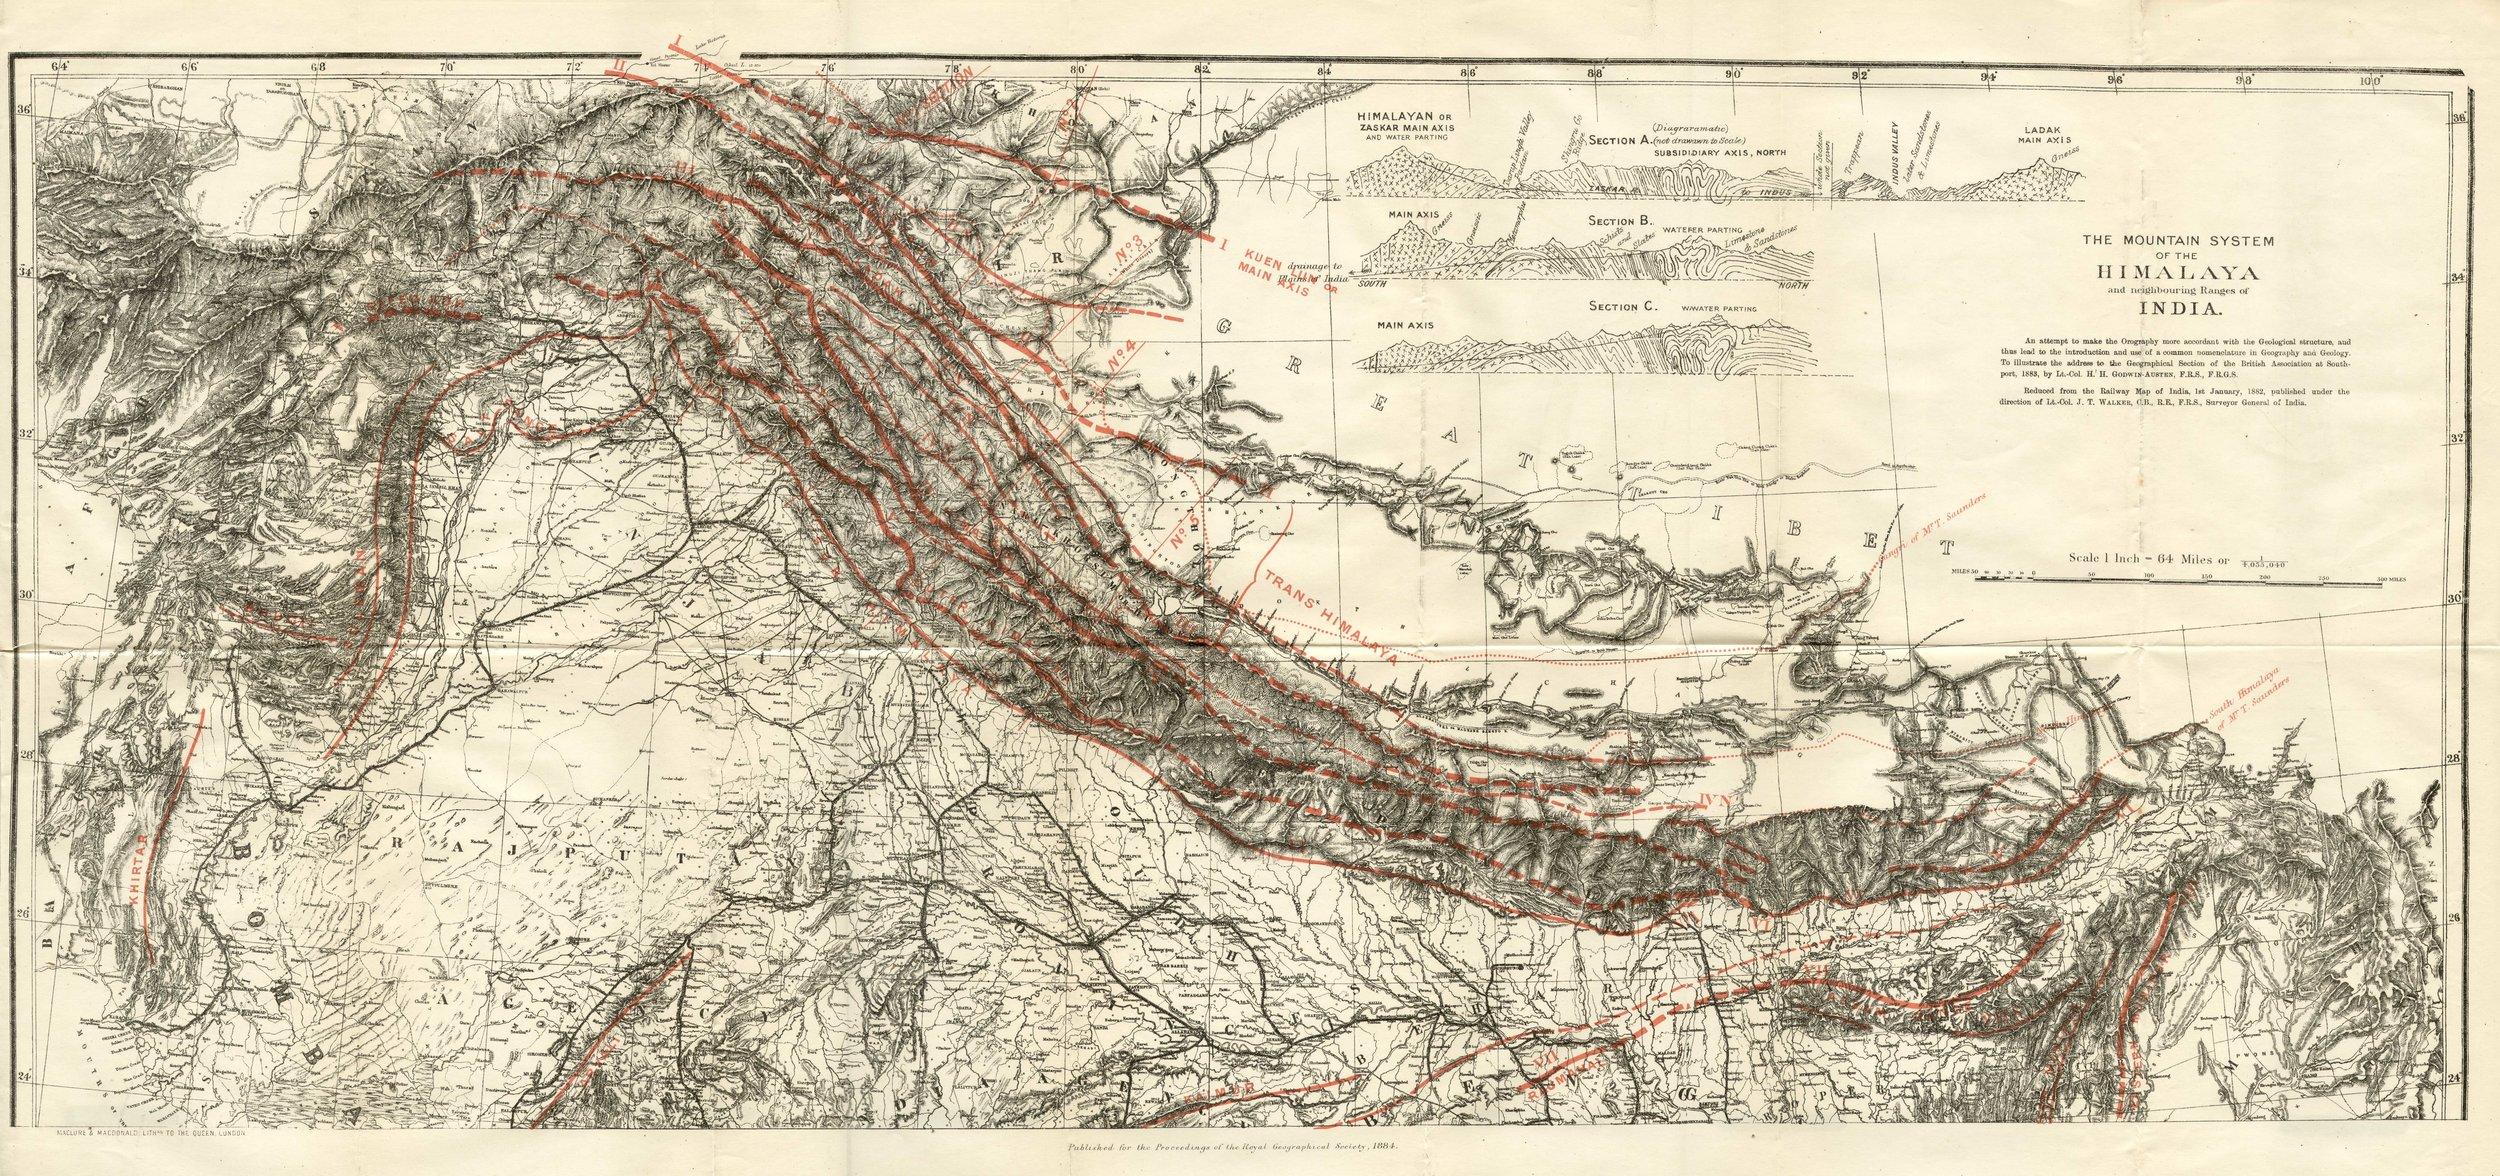 1884 Mountain System of Himalaya.jpg